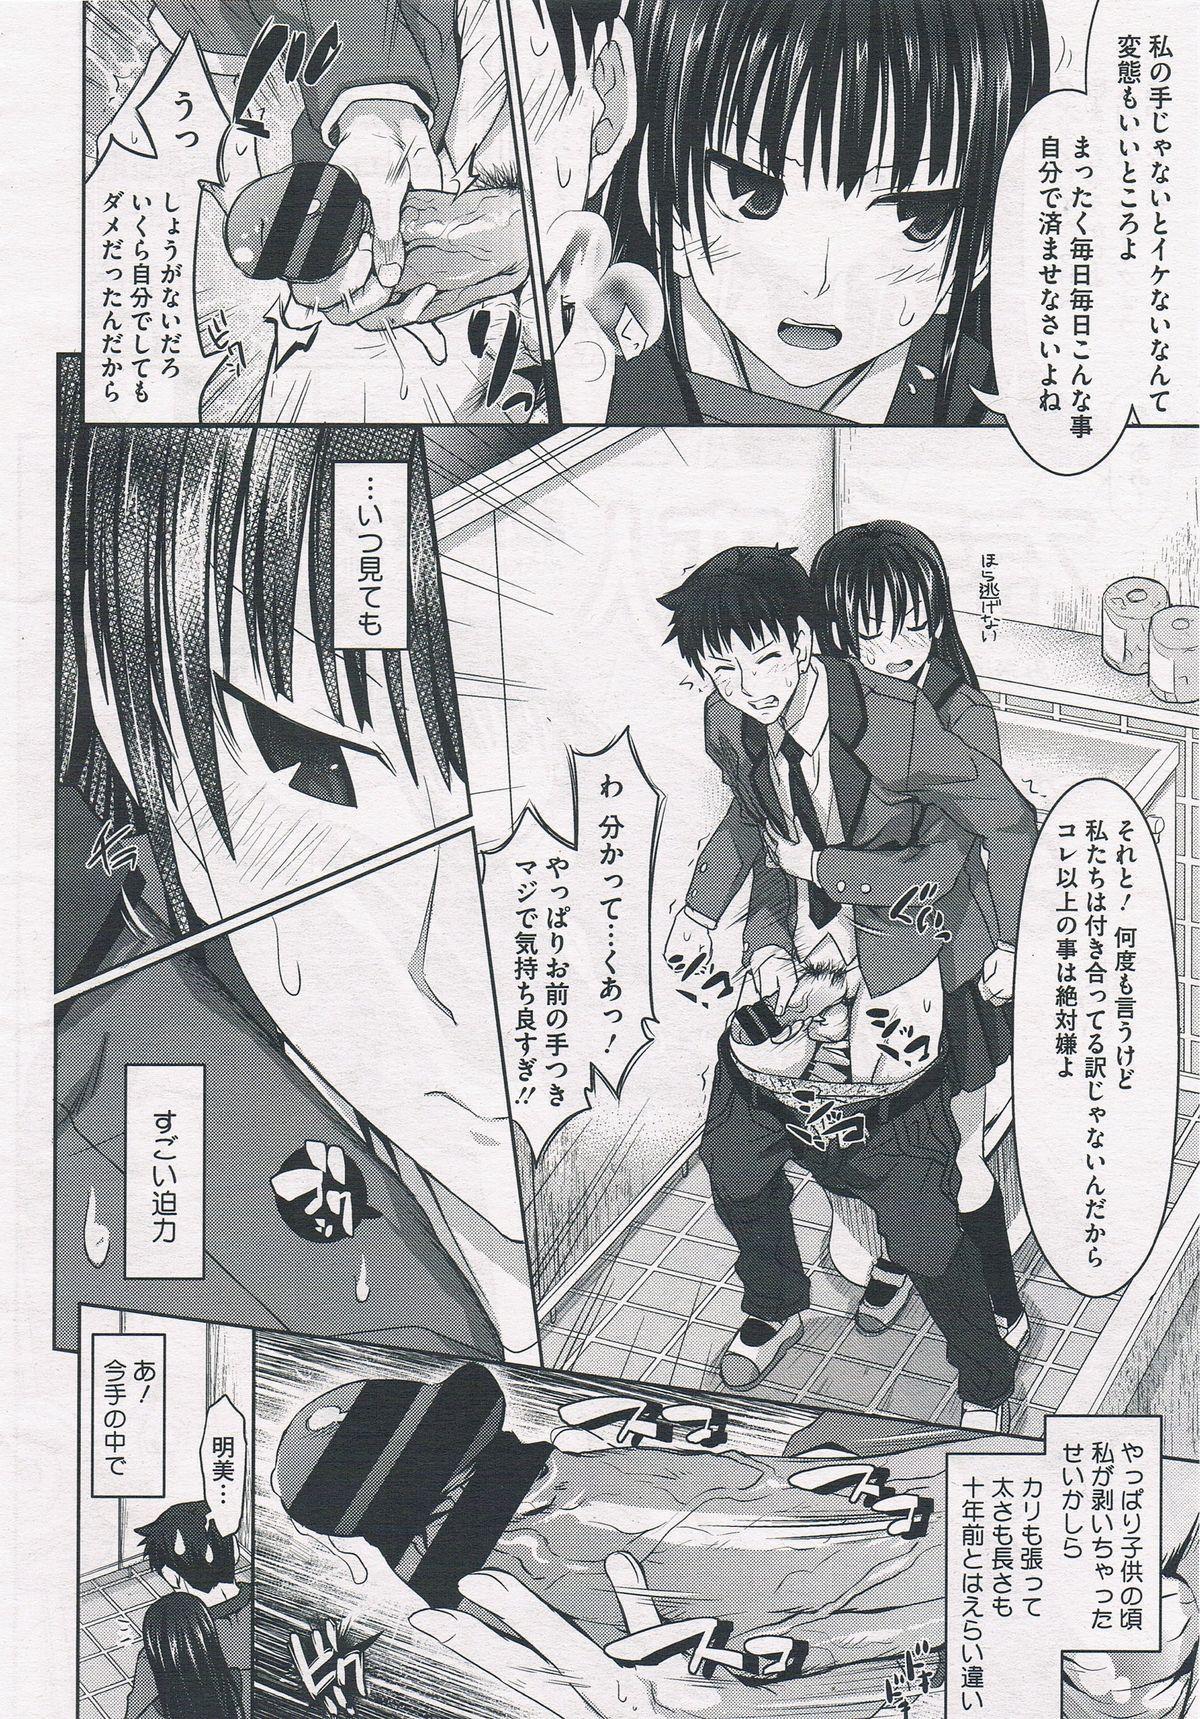 Migite no koibito COMIC Megastore 2012-07 1